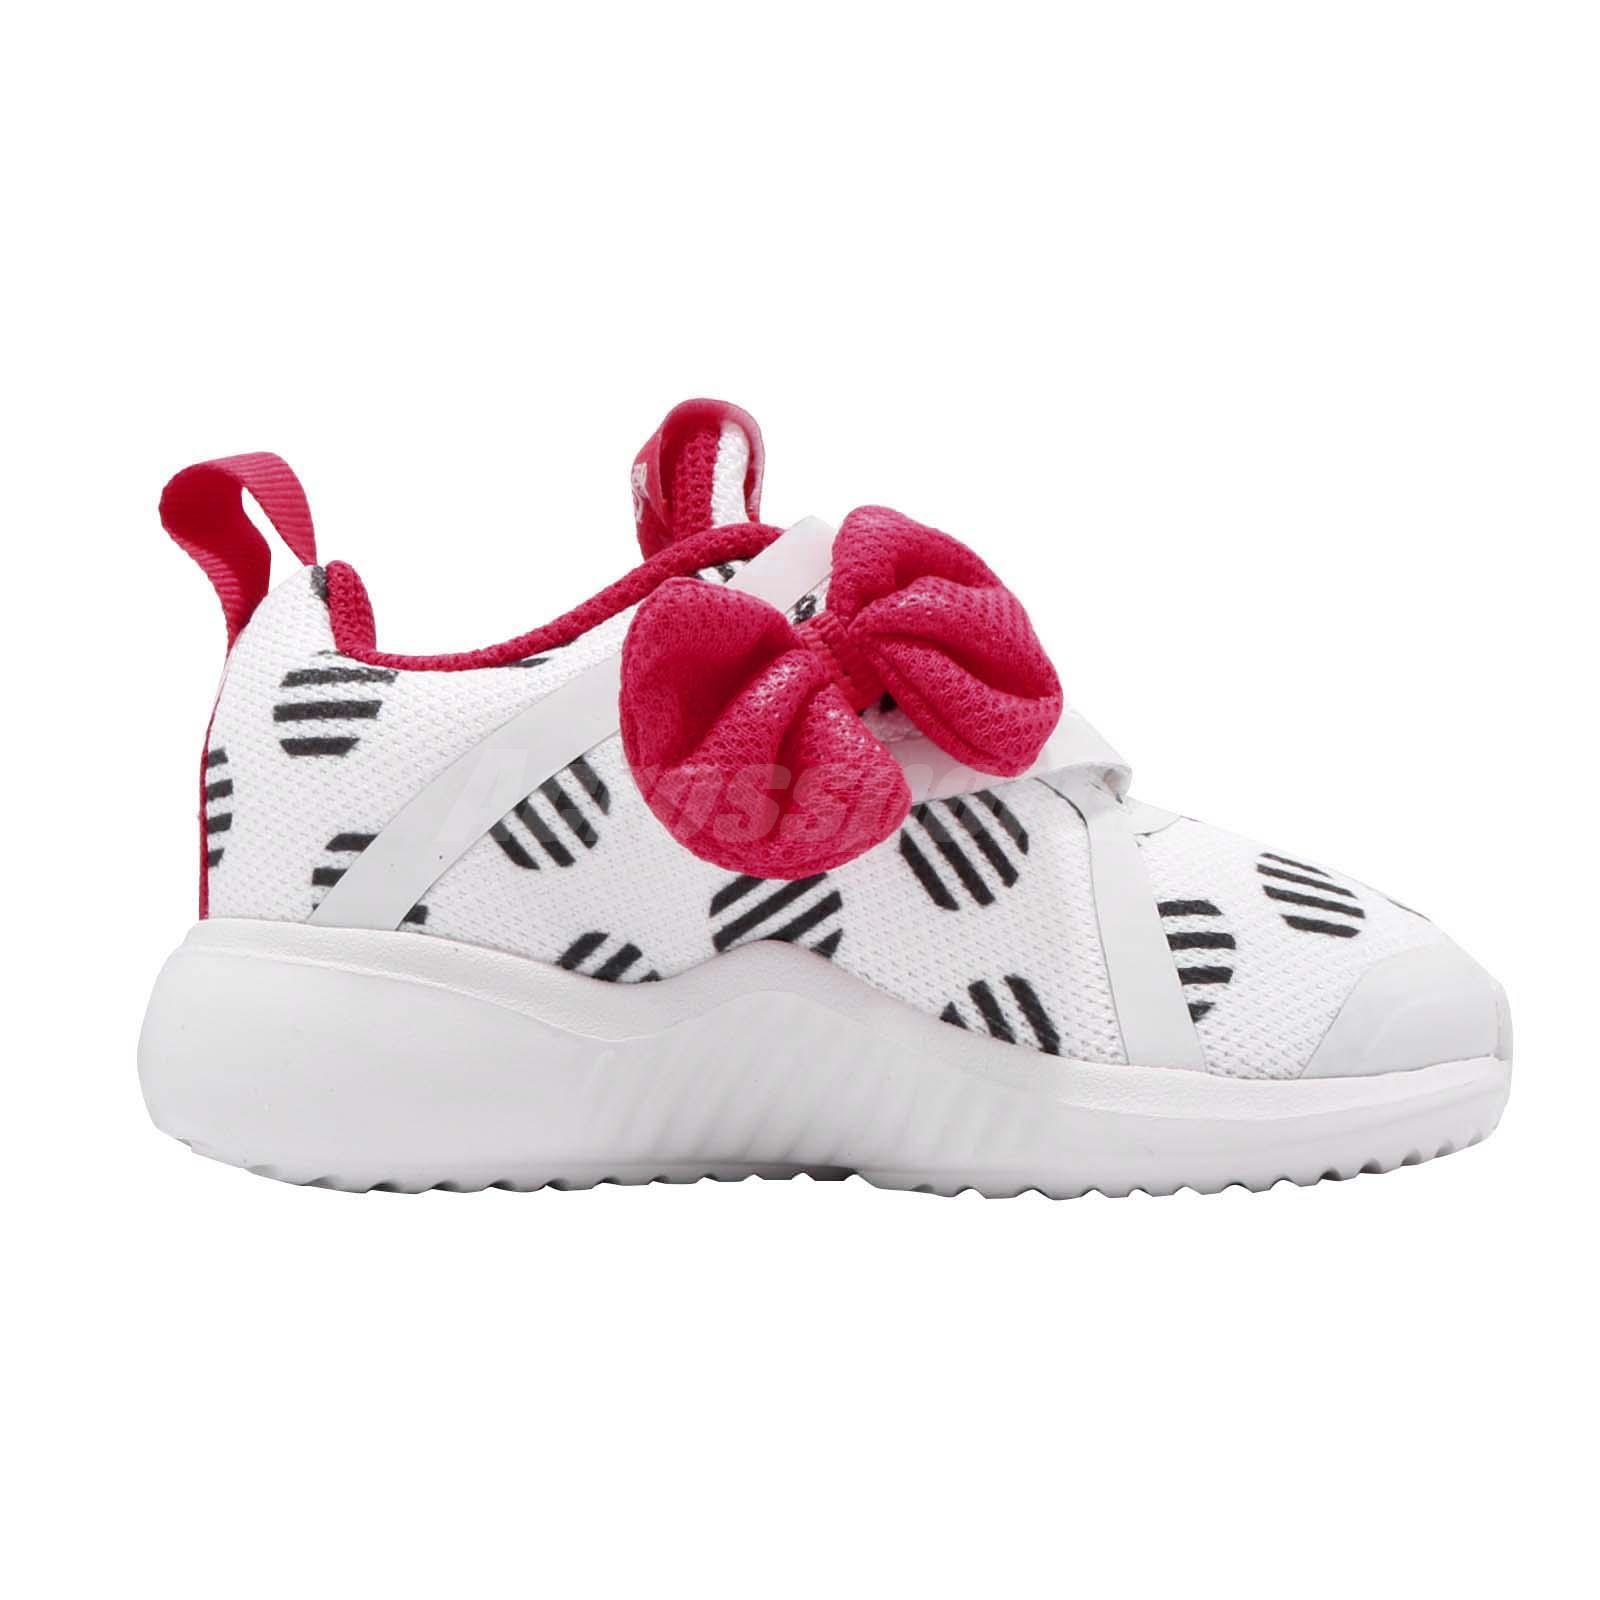 04b2a652d30 adidas FortaRun X Minnie CF I Disney White Pink TD Toddler Infant ...